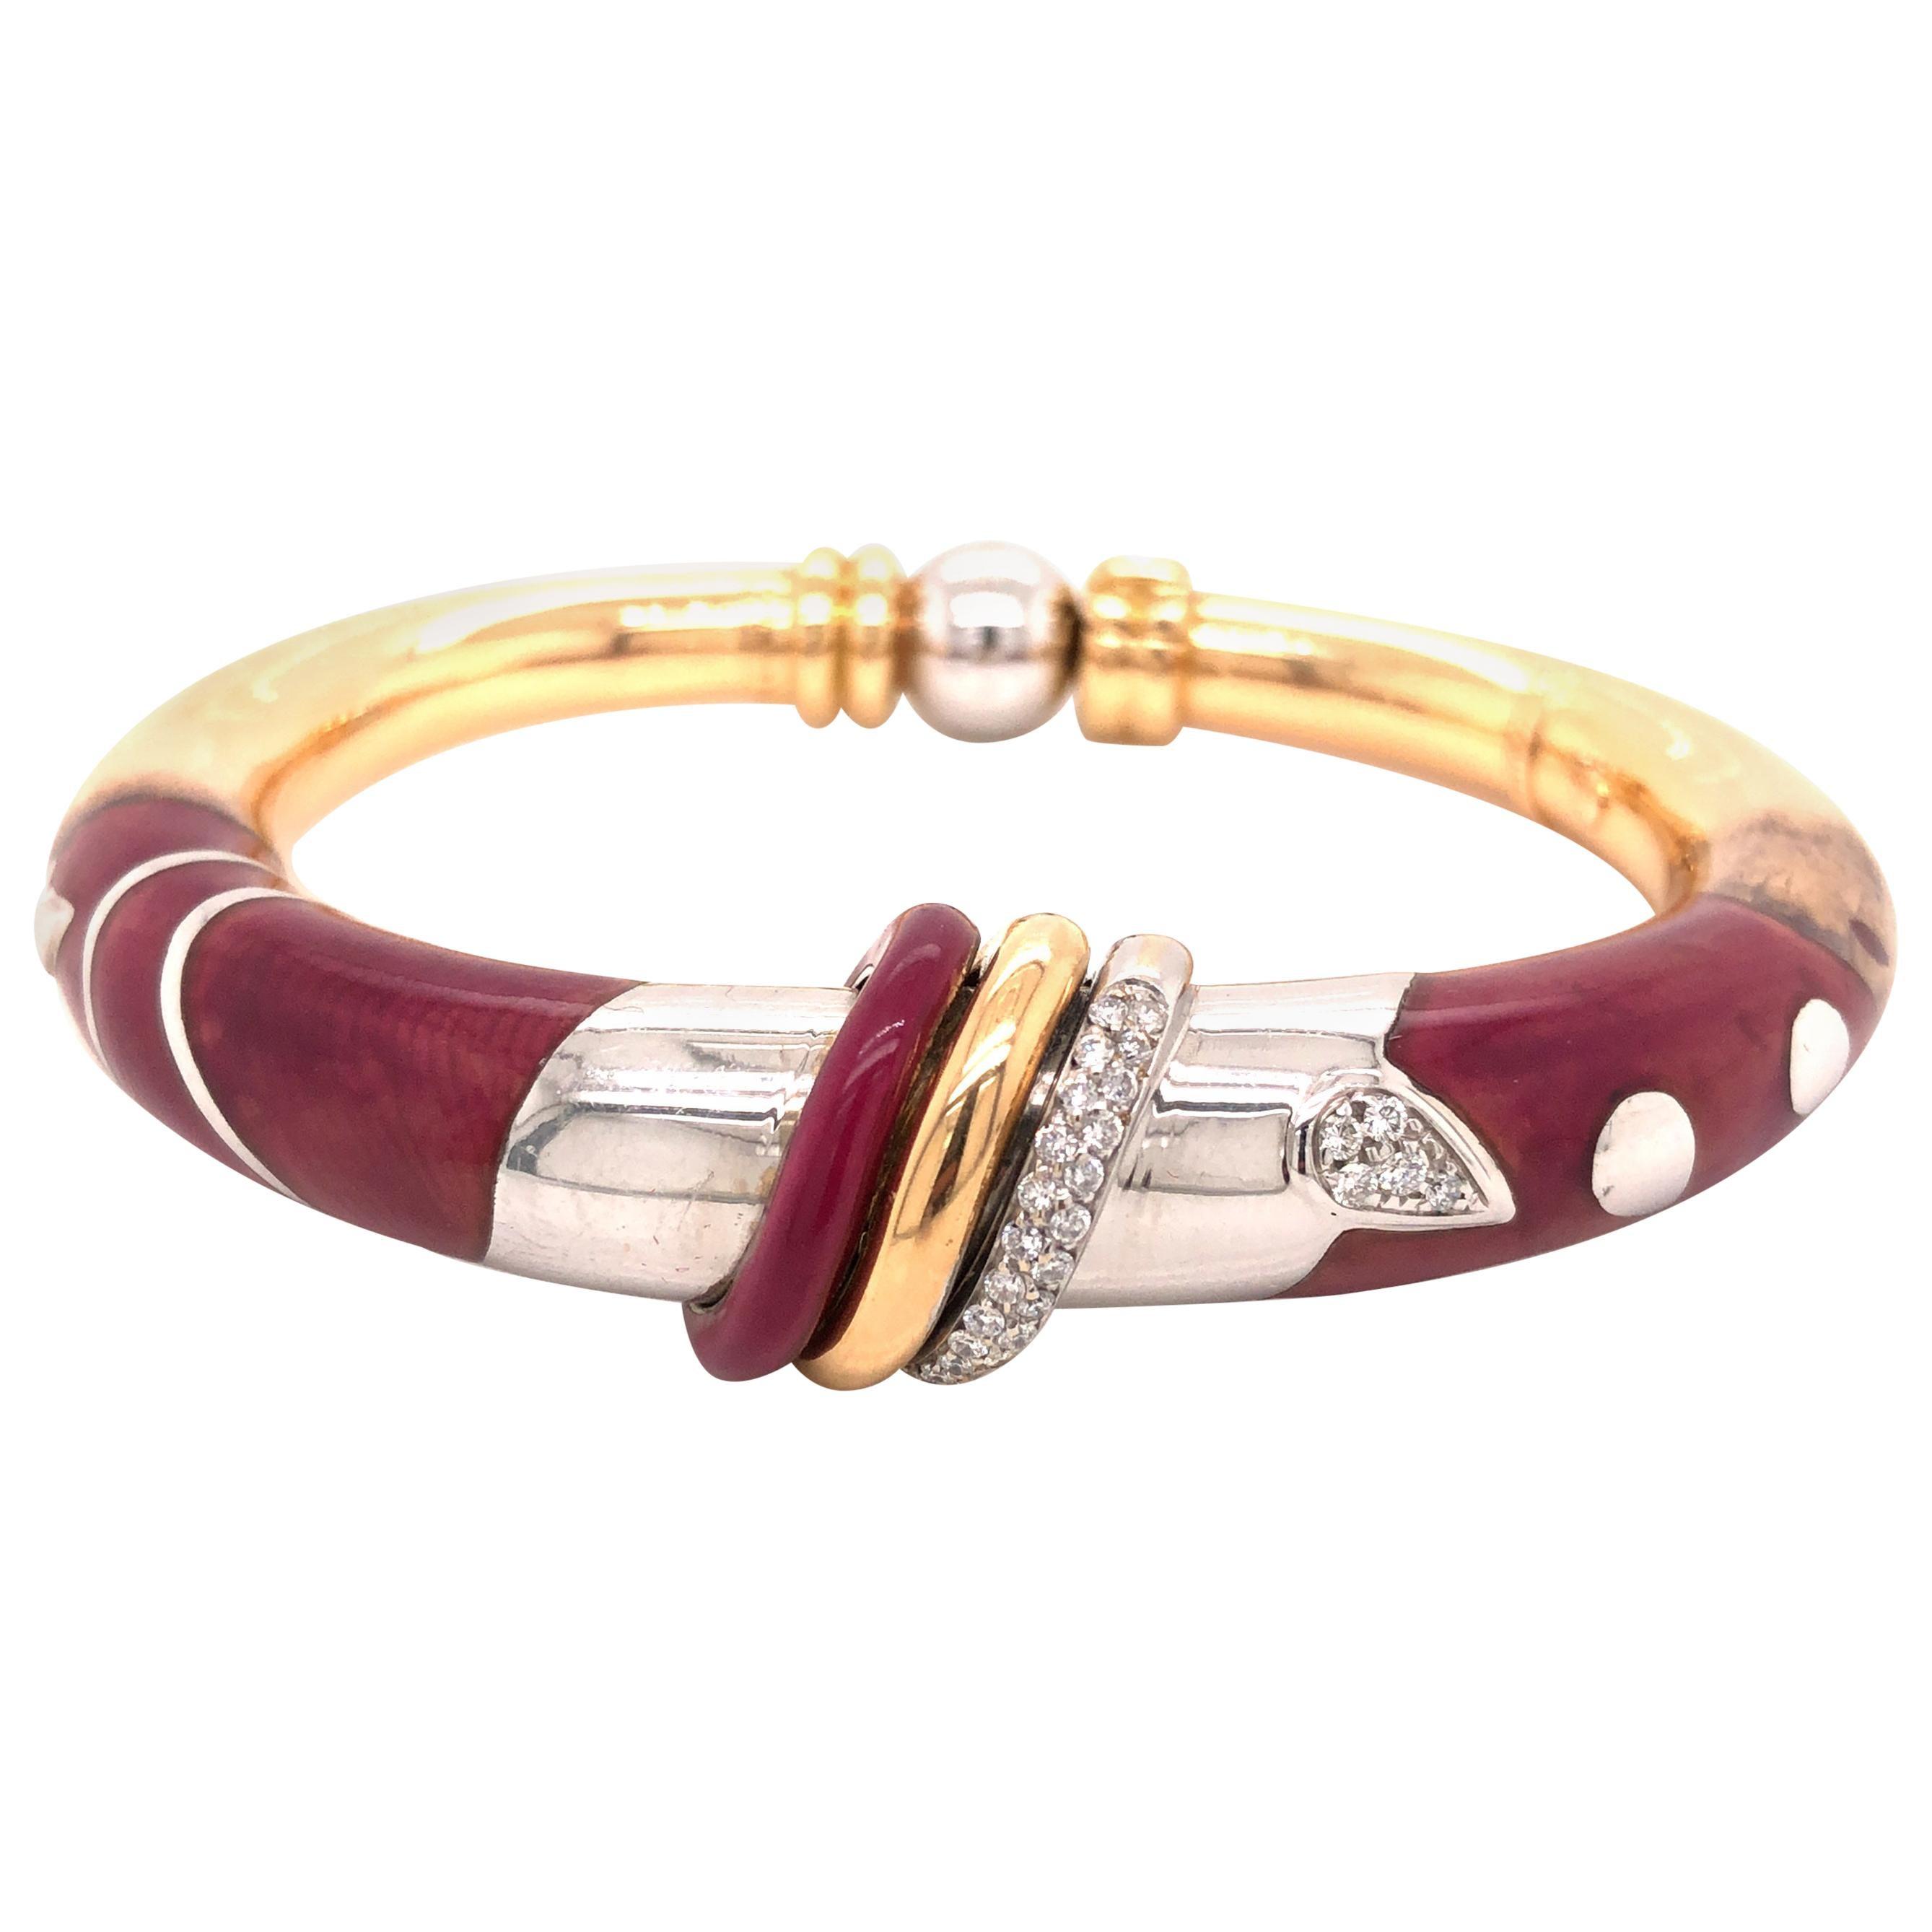 La Nouvelle Bague 18K Gold and Sterling Silver Enamel Diamond Bangle Bracelet